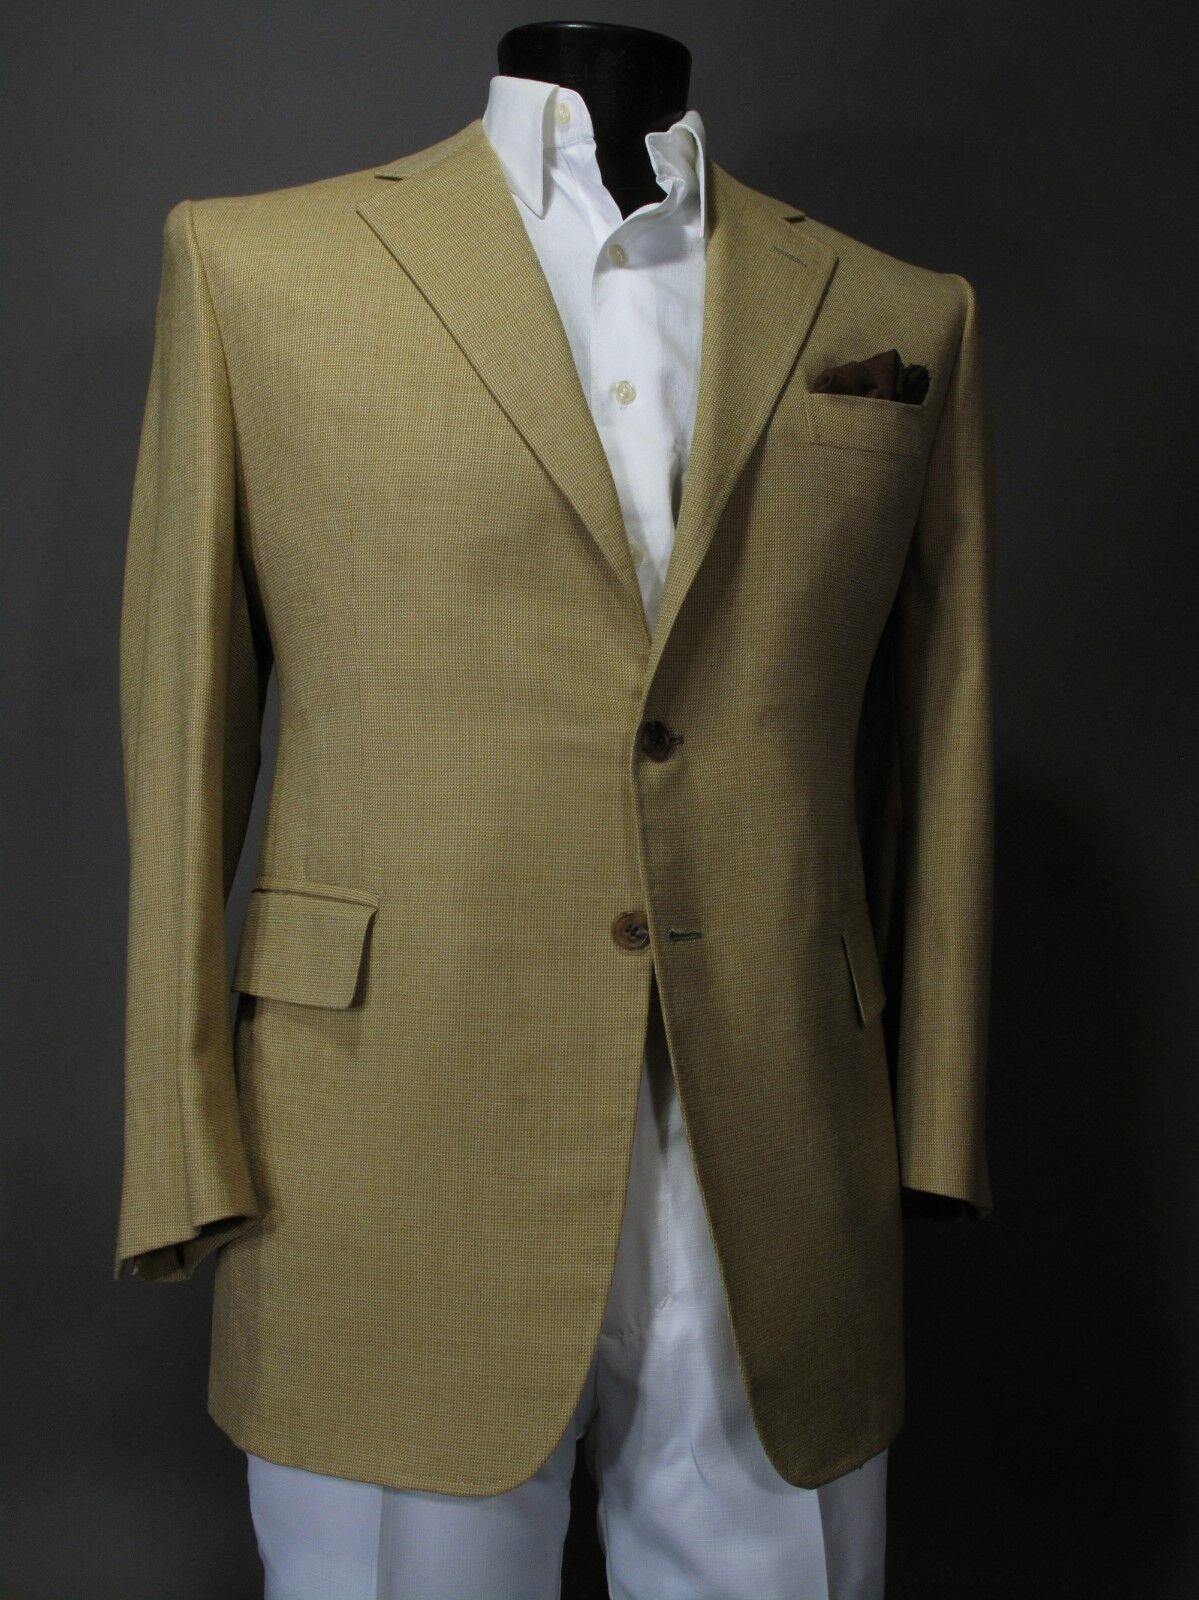 Uma Reddy NY Bespoke Savile Row Tailoring Sport Coat 42R Silk & Wool Blend